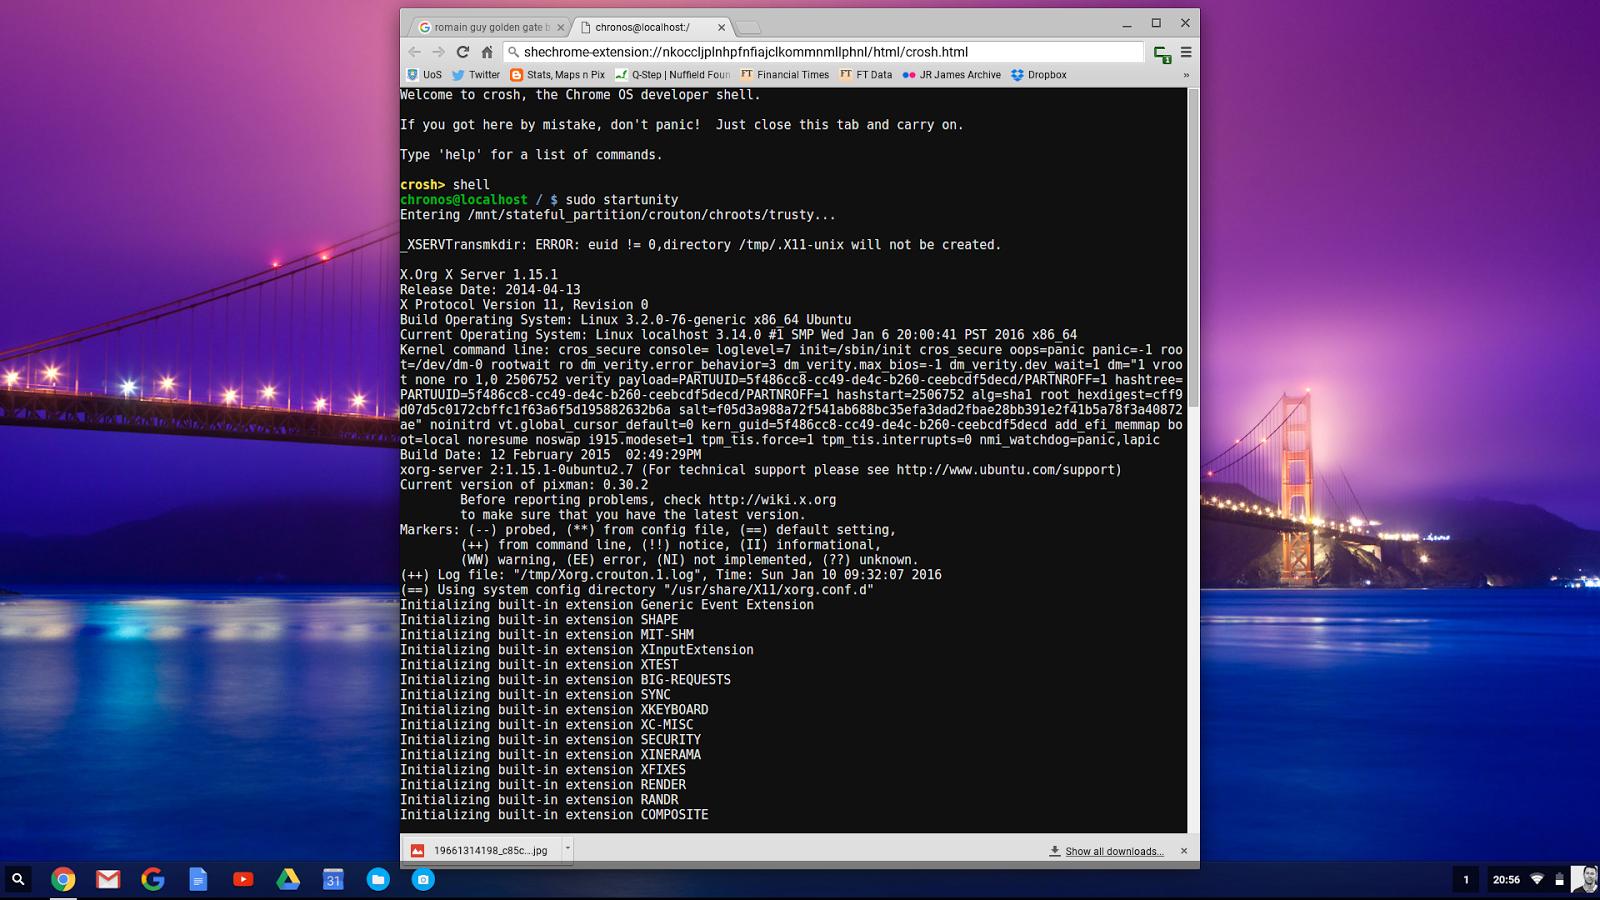 Stats, Maps n Pix: Running QGIS on a Chromebook